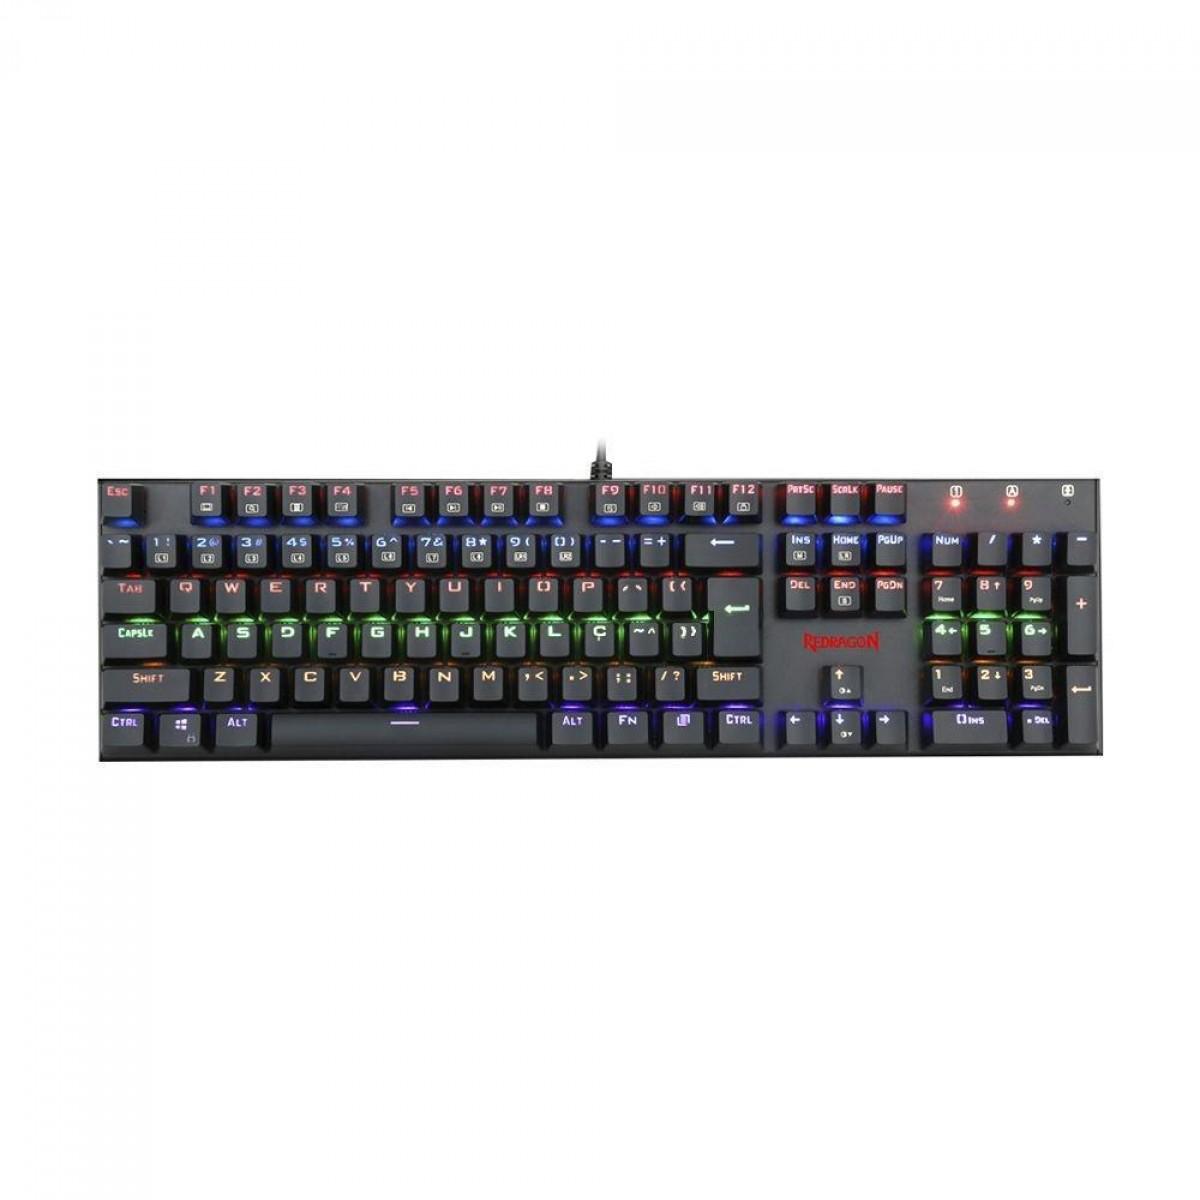 Teclado Mecânico Gamer Redragon Rudra Rainbow, Switch Blue Removíveis, ABNT, Black, K565R-2 PT-BLUE